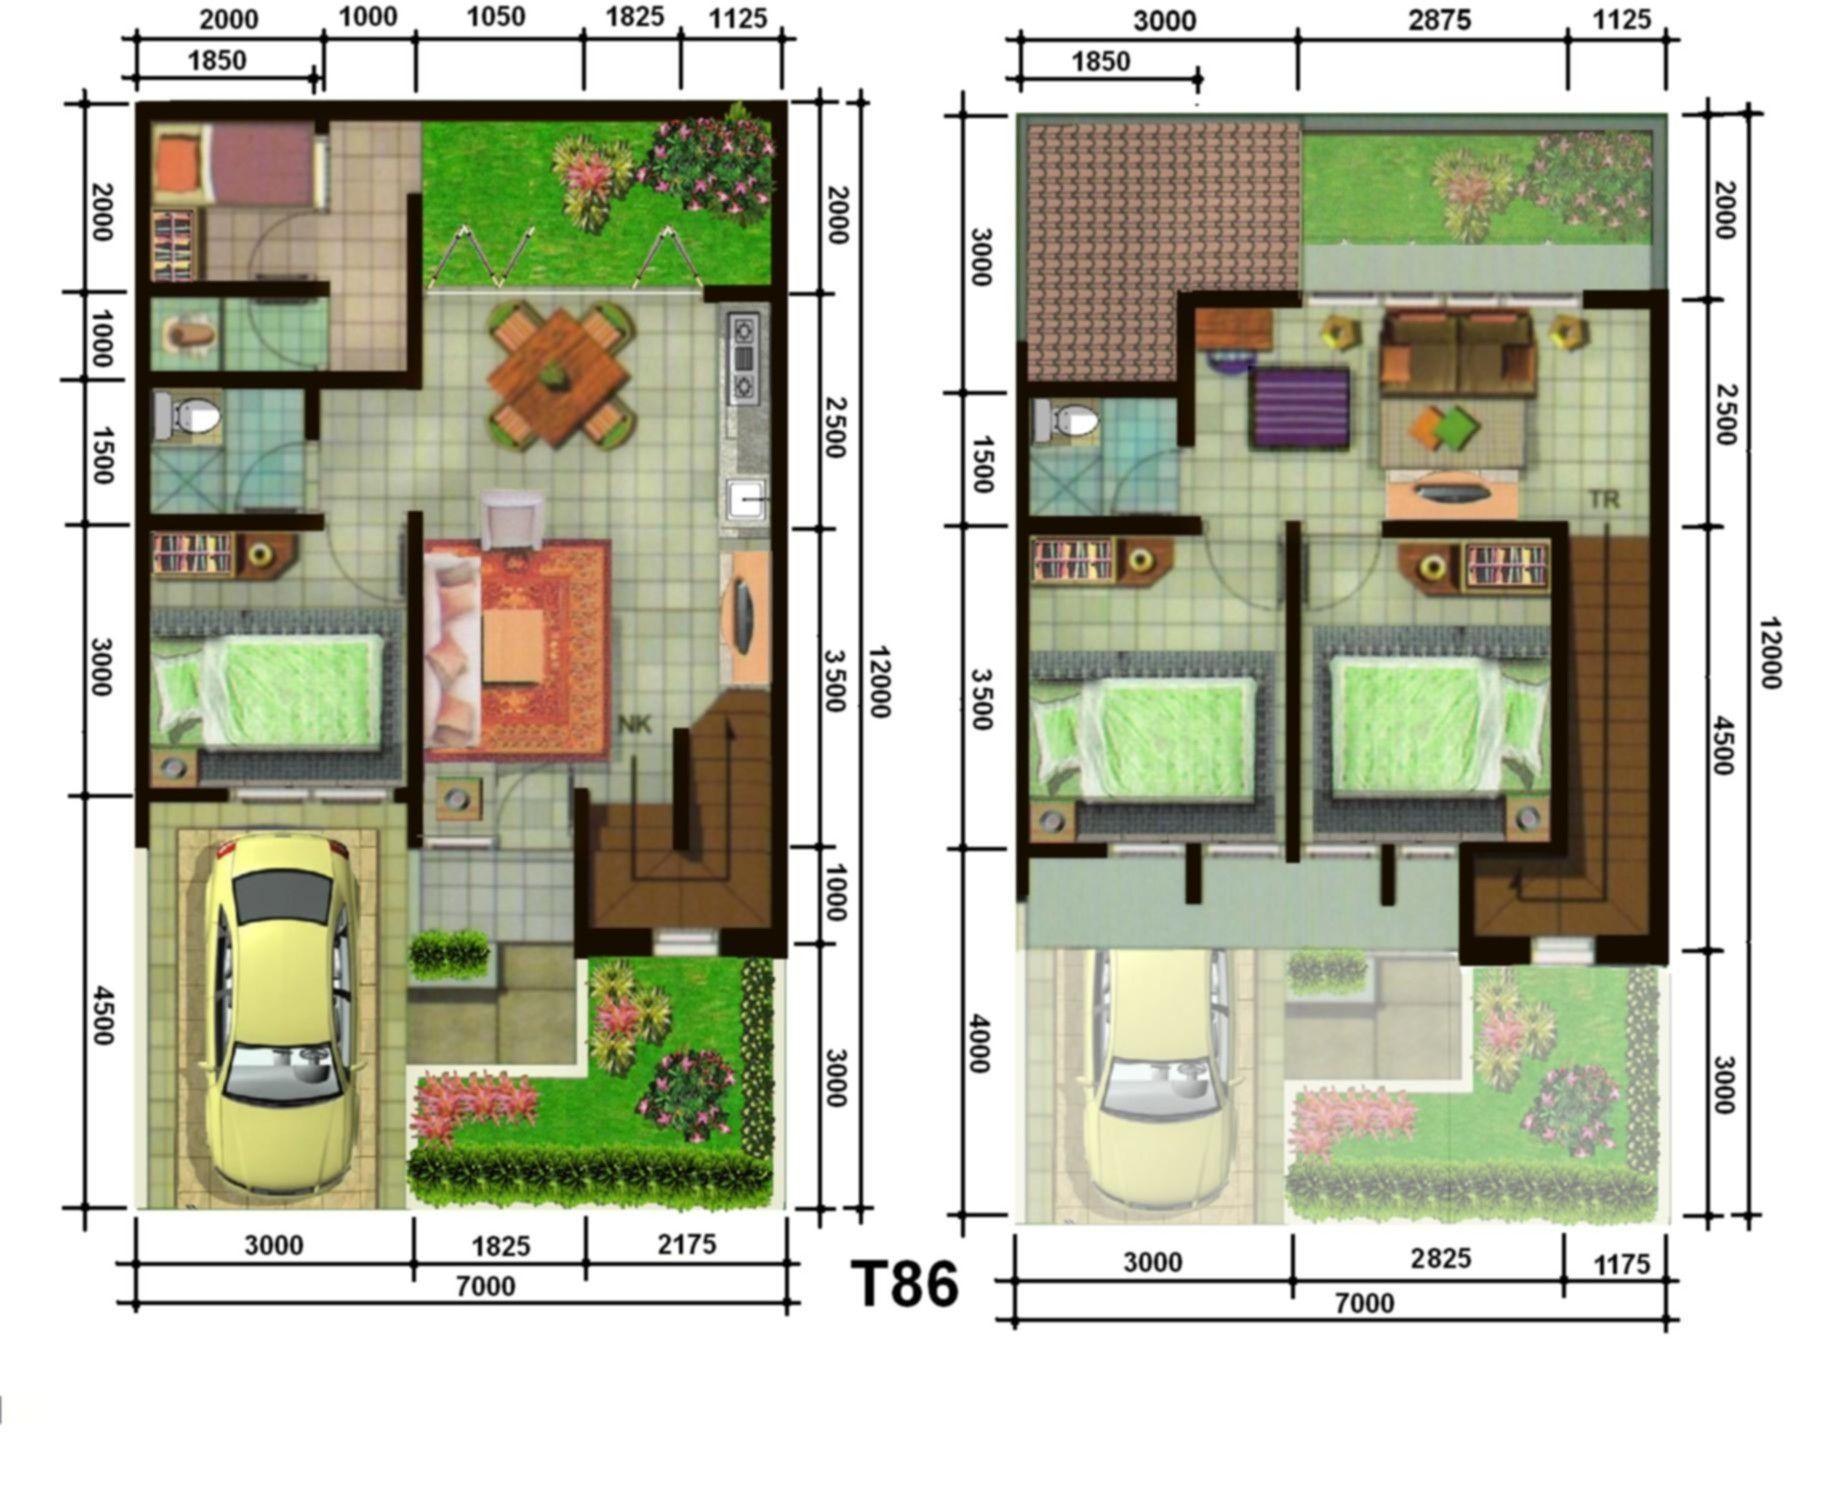 Gambar Denah Rumah Minimalis 1 Lantai Type 45 Pinterest